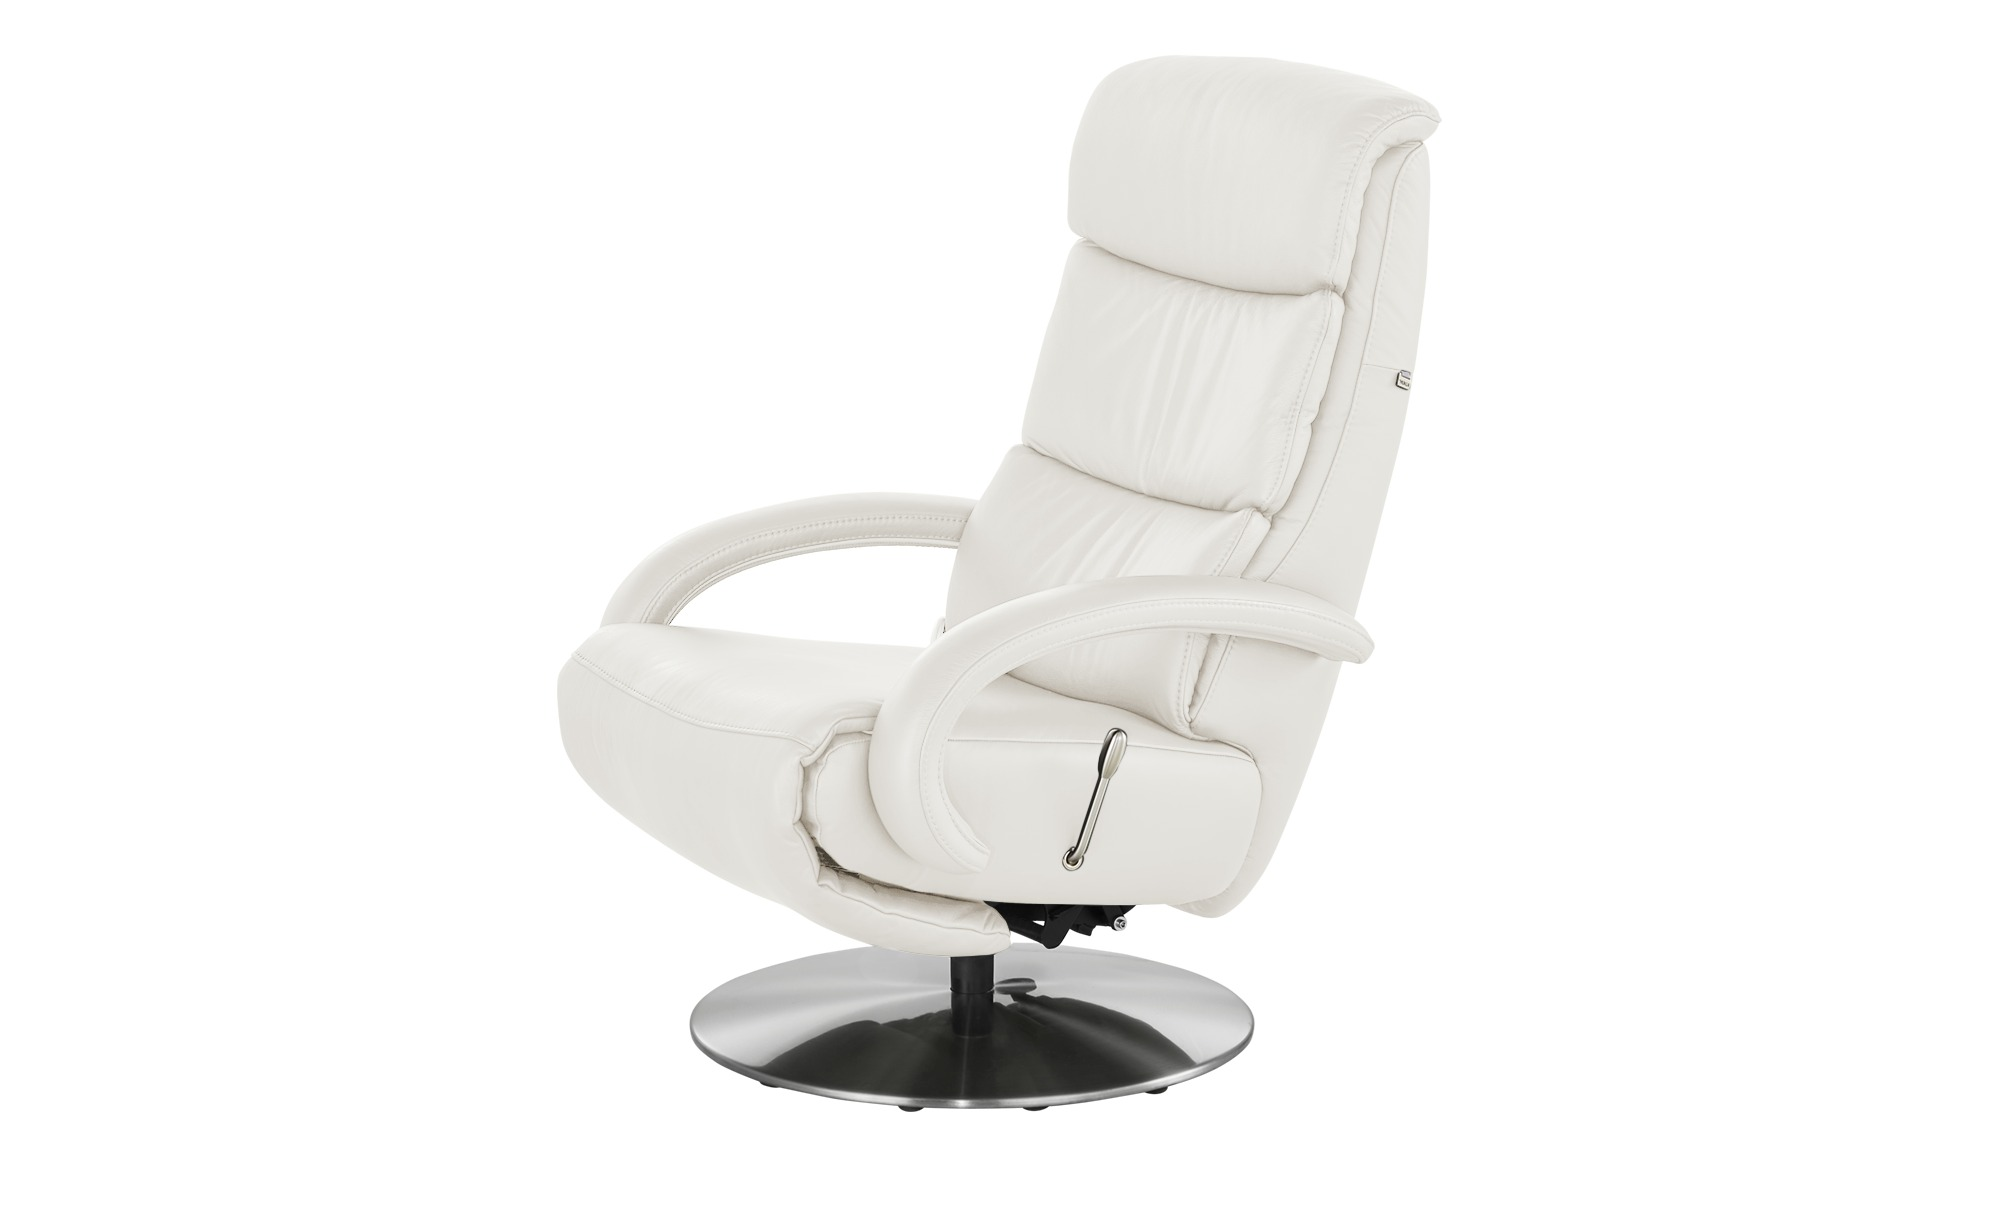 Hukla Leder-Relaxsessel  Florian ¦ weiß ¦ Maße (cm): B: 73 H: 109 T: 91 Polstermöbel > Sessel > Fernsehsessel - Höffner